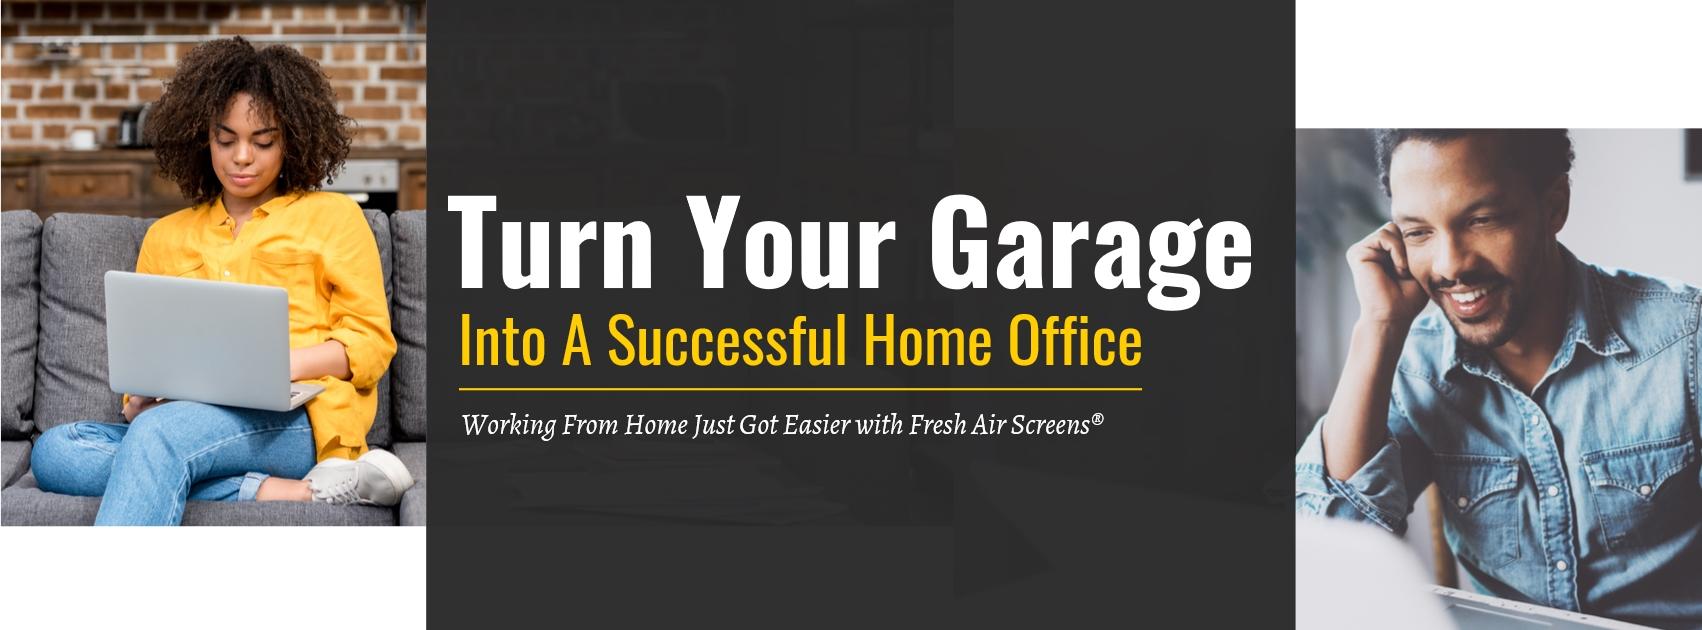 Garage Into Office Banner